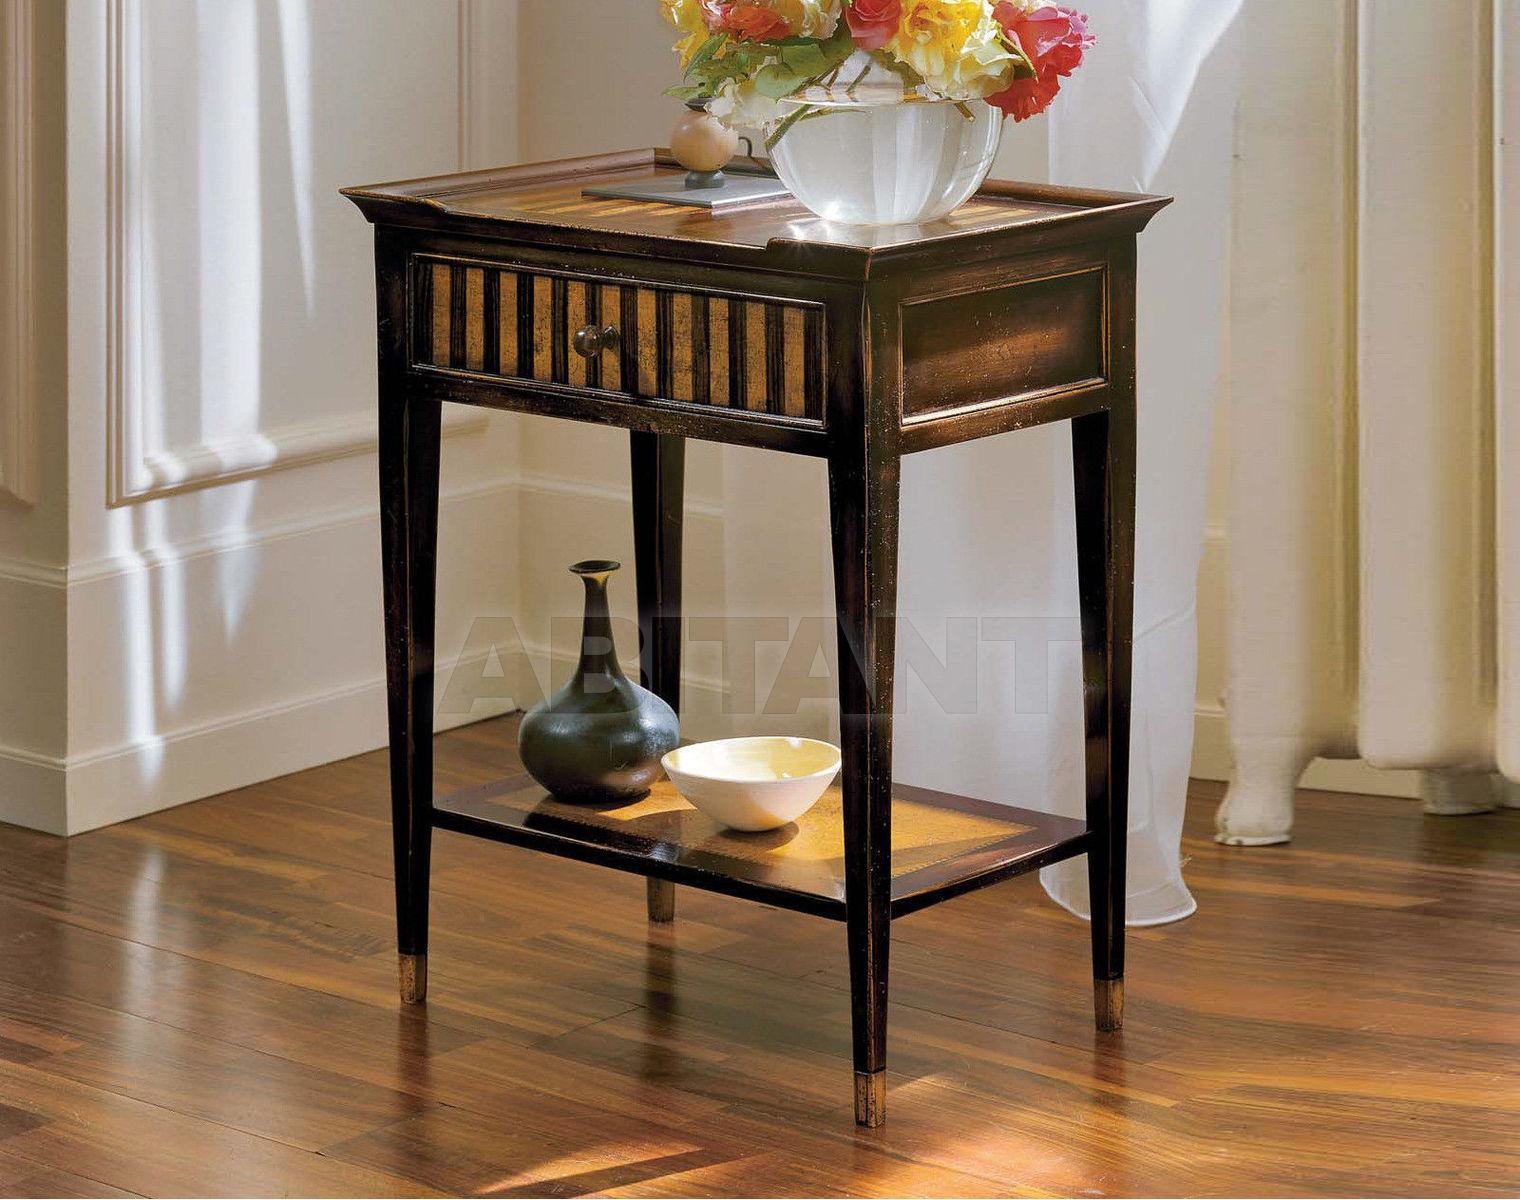 Купить Столик приставной Pregno Gli Originali TL24